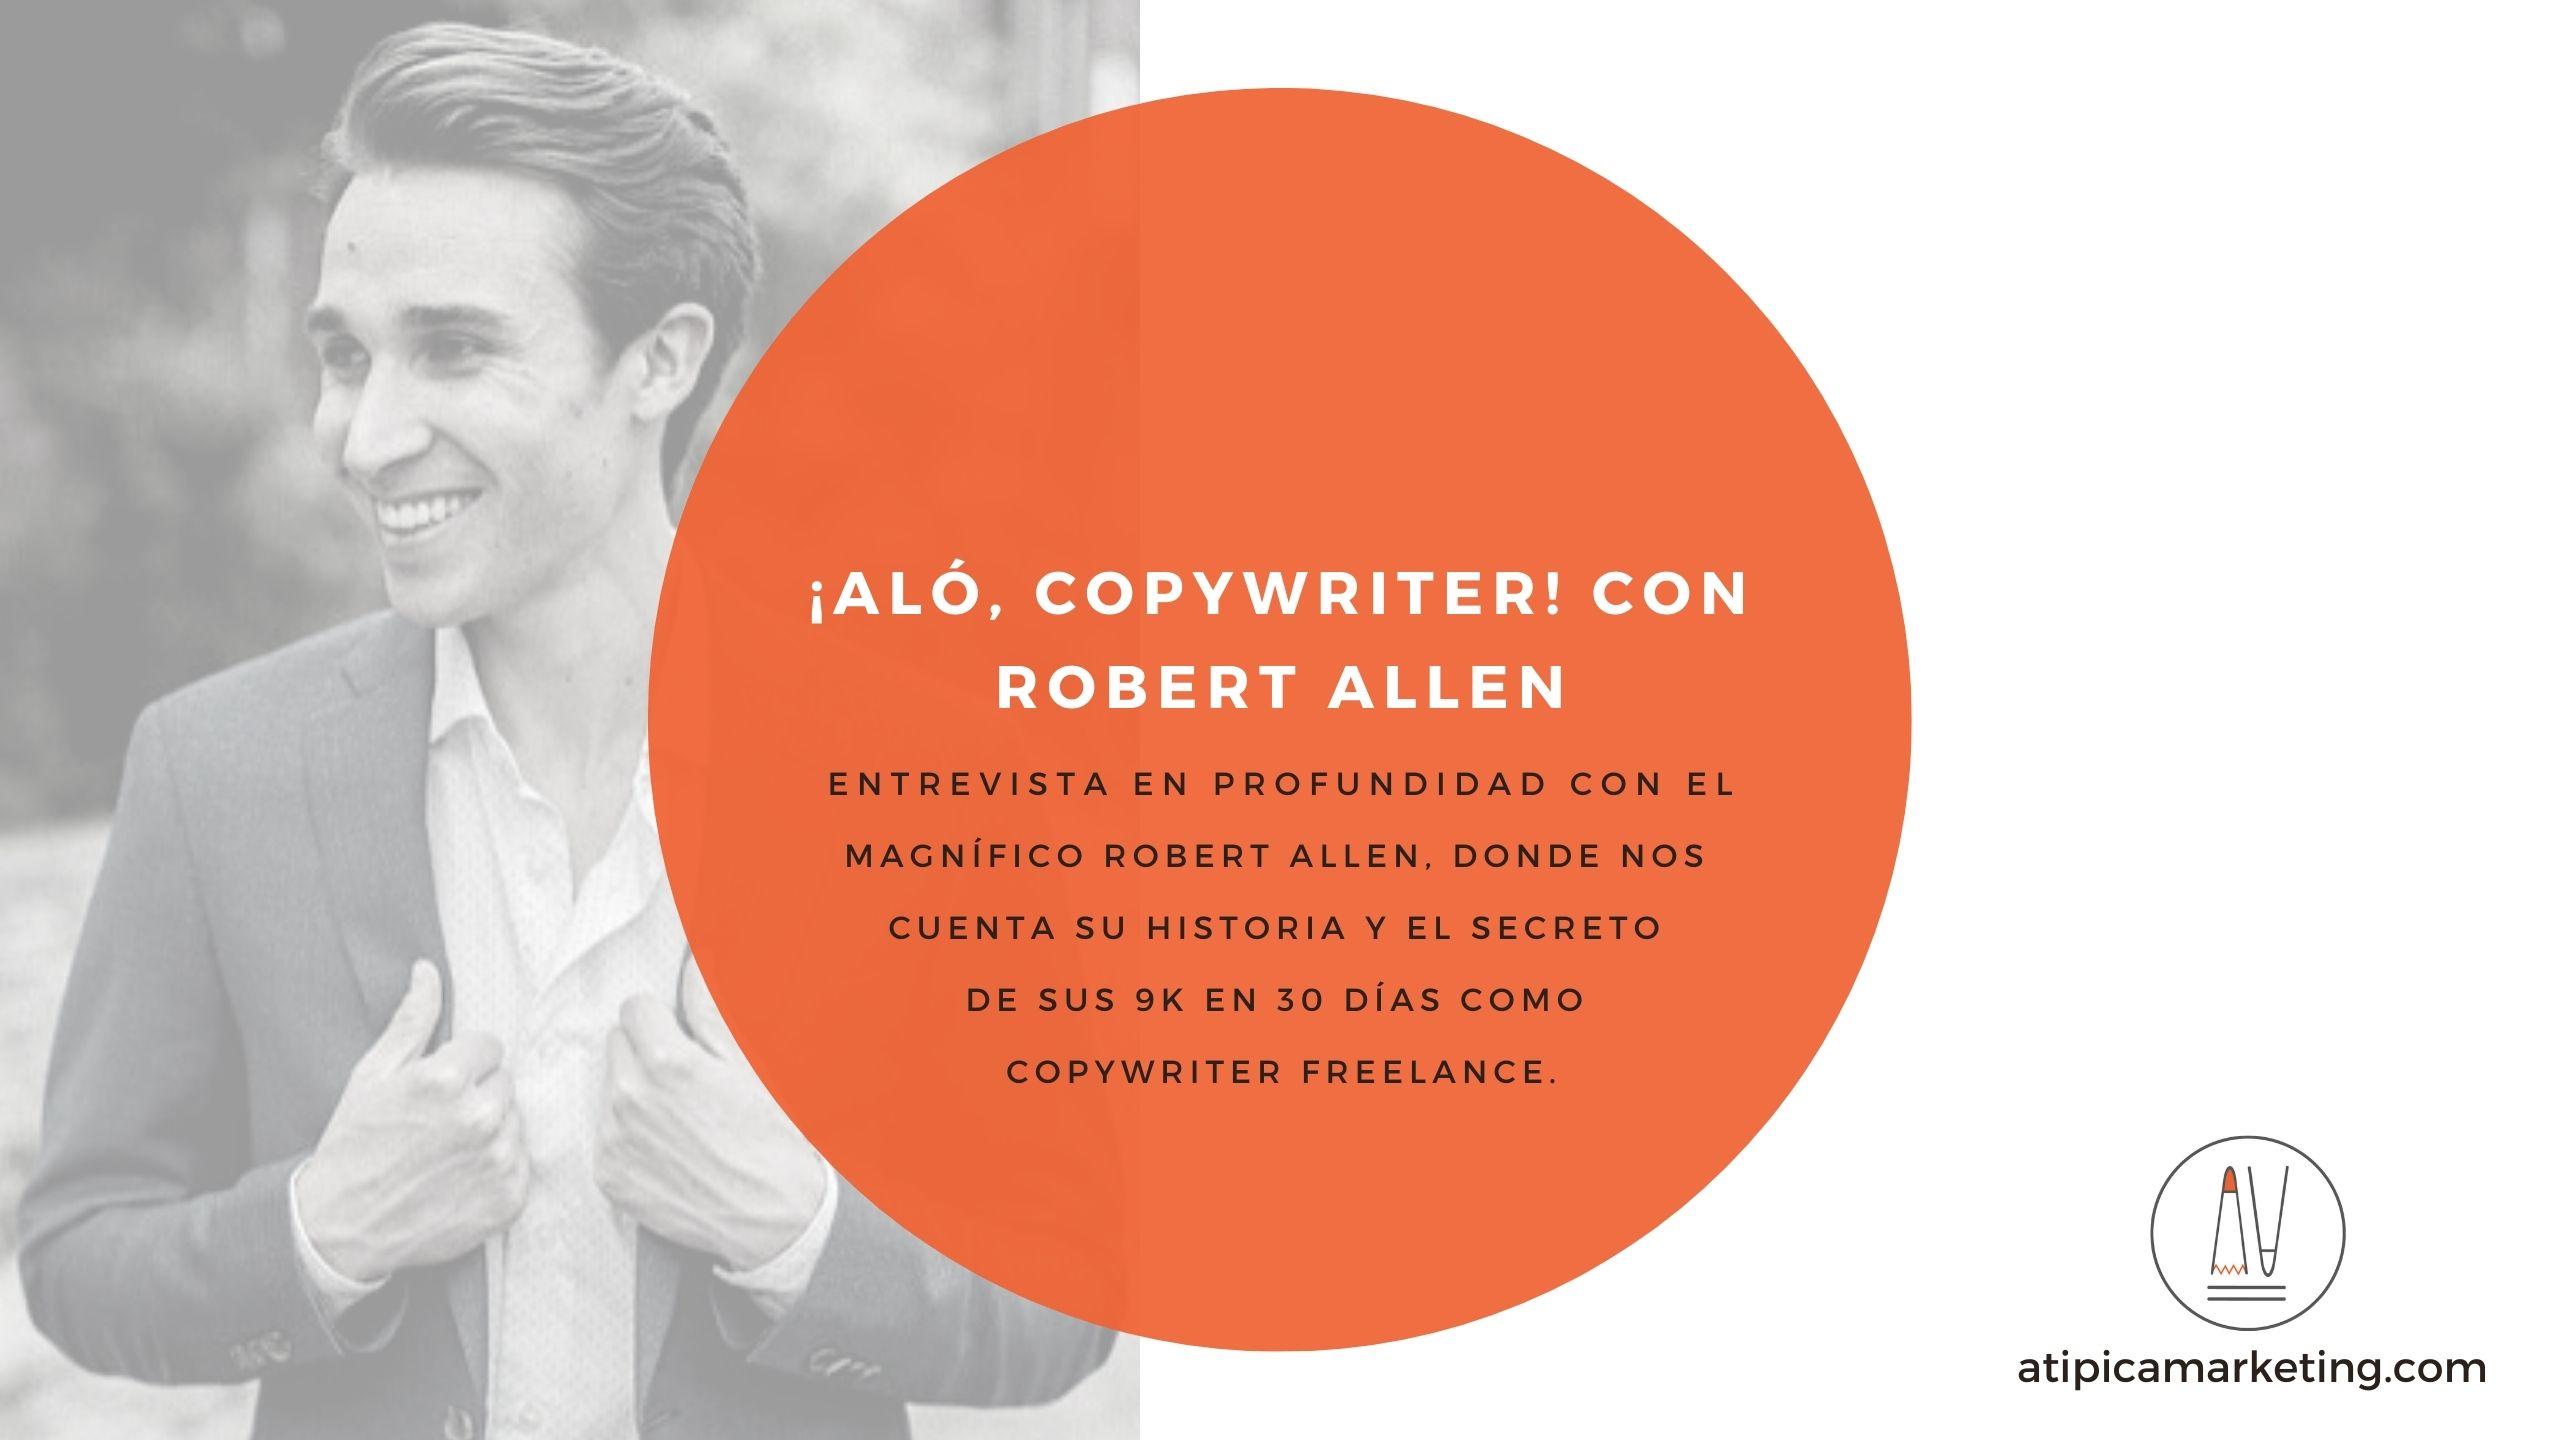 Alo Copywriter Robert Allen